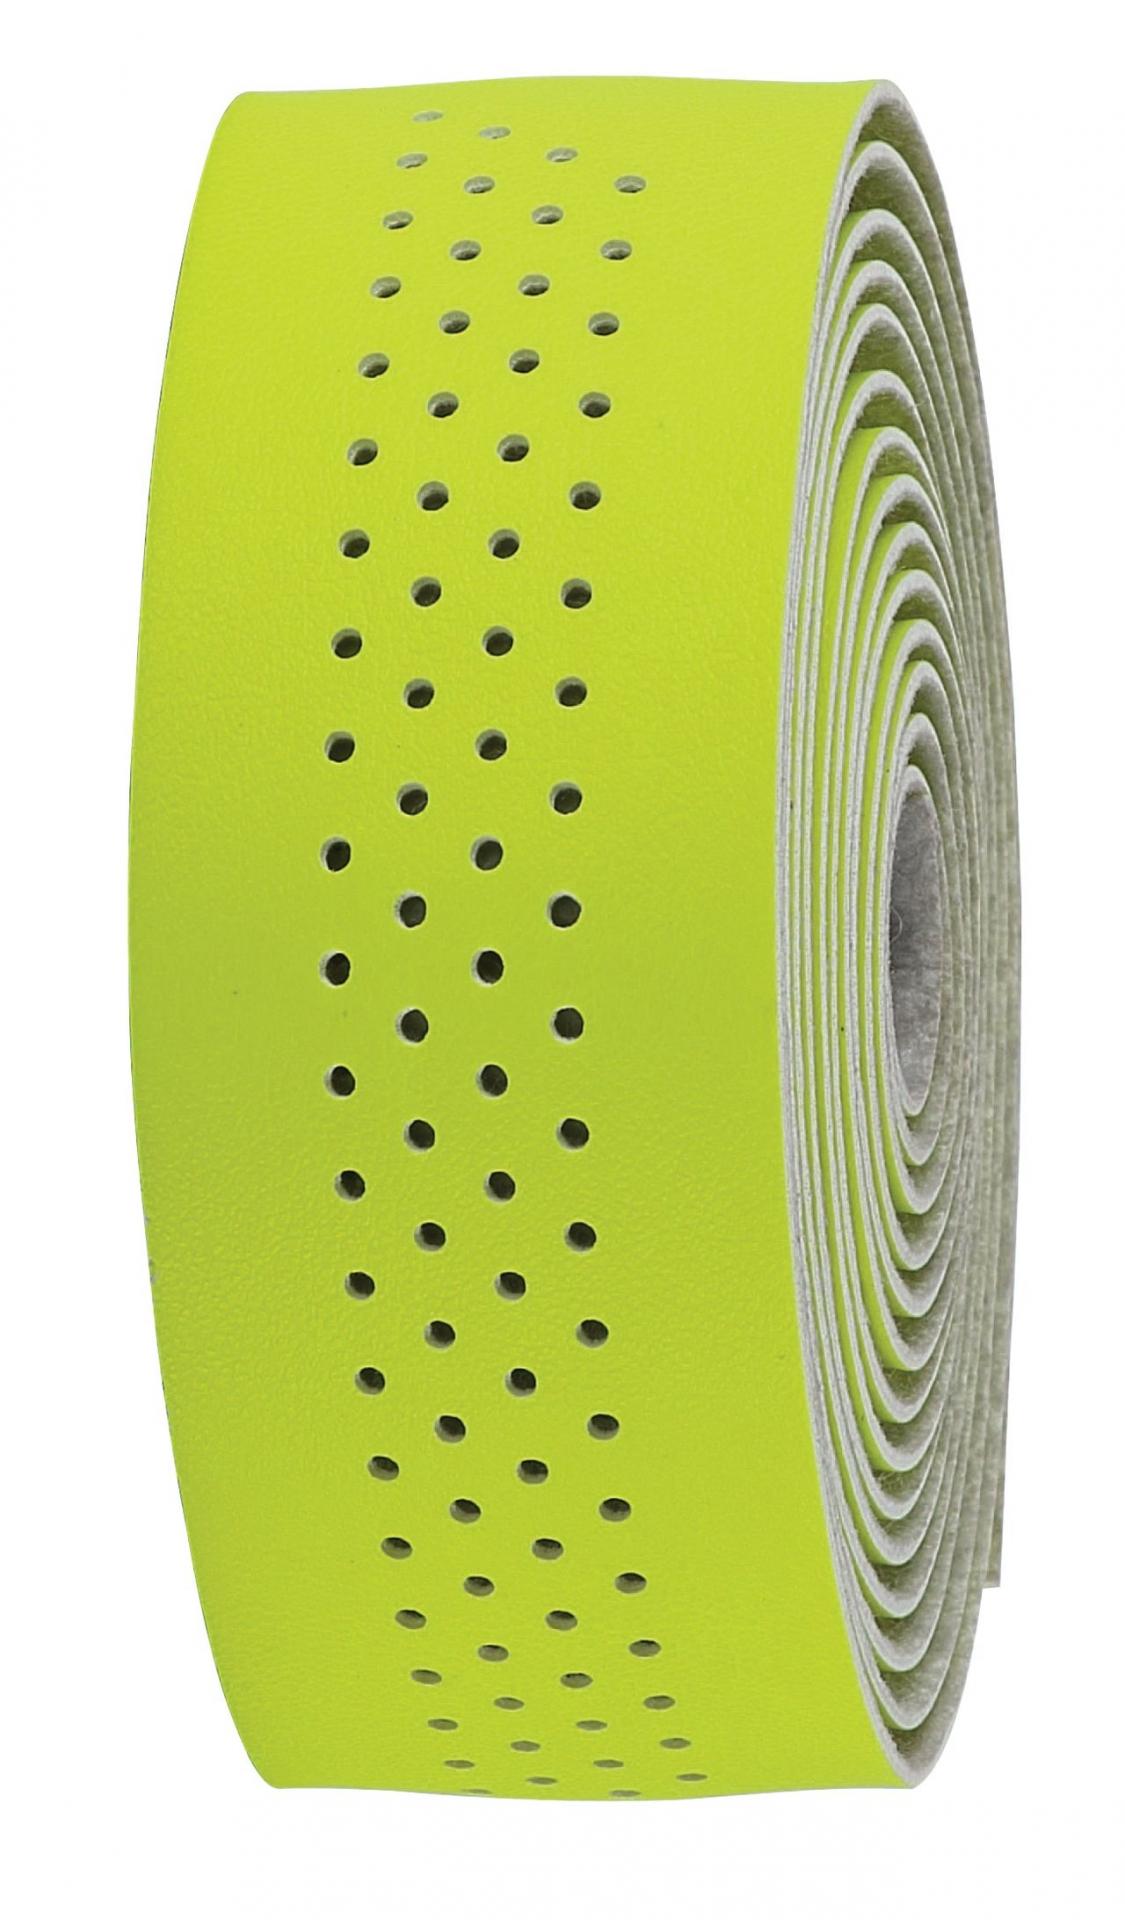 Ruban de cintre BBB SpeedRibbon (jaune fluo) - BHT-12